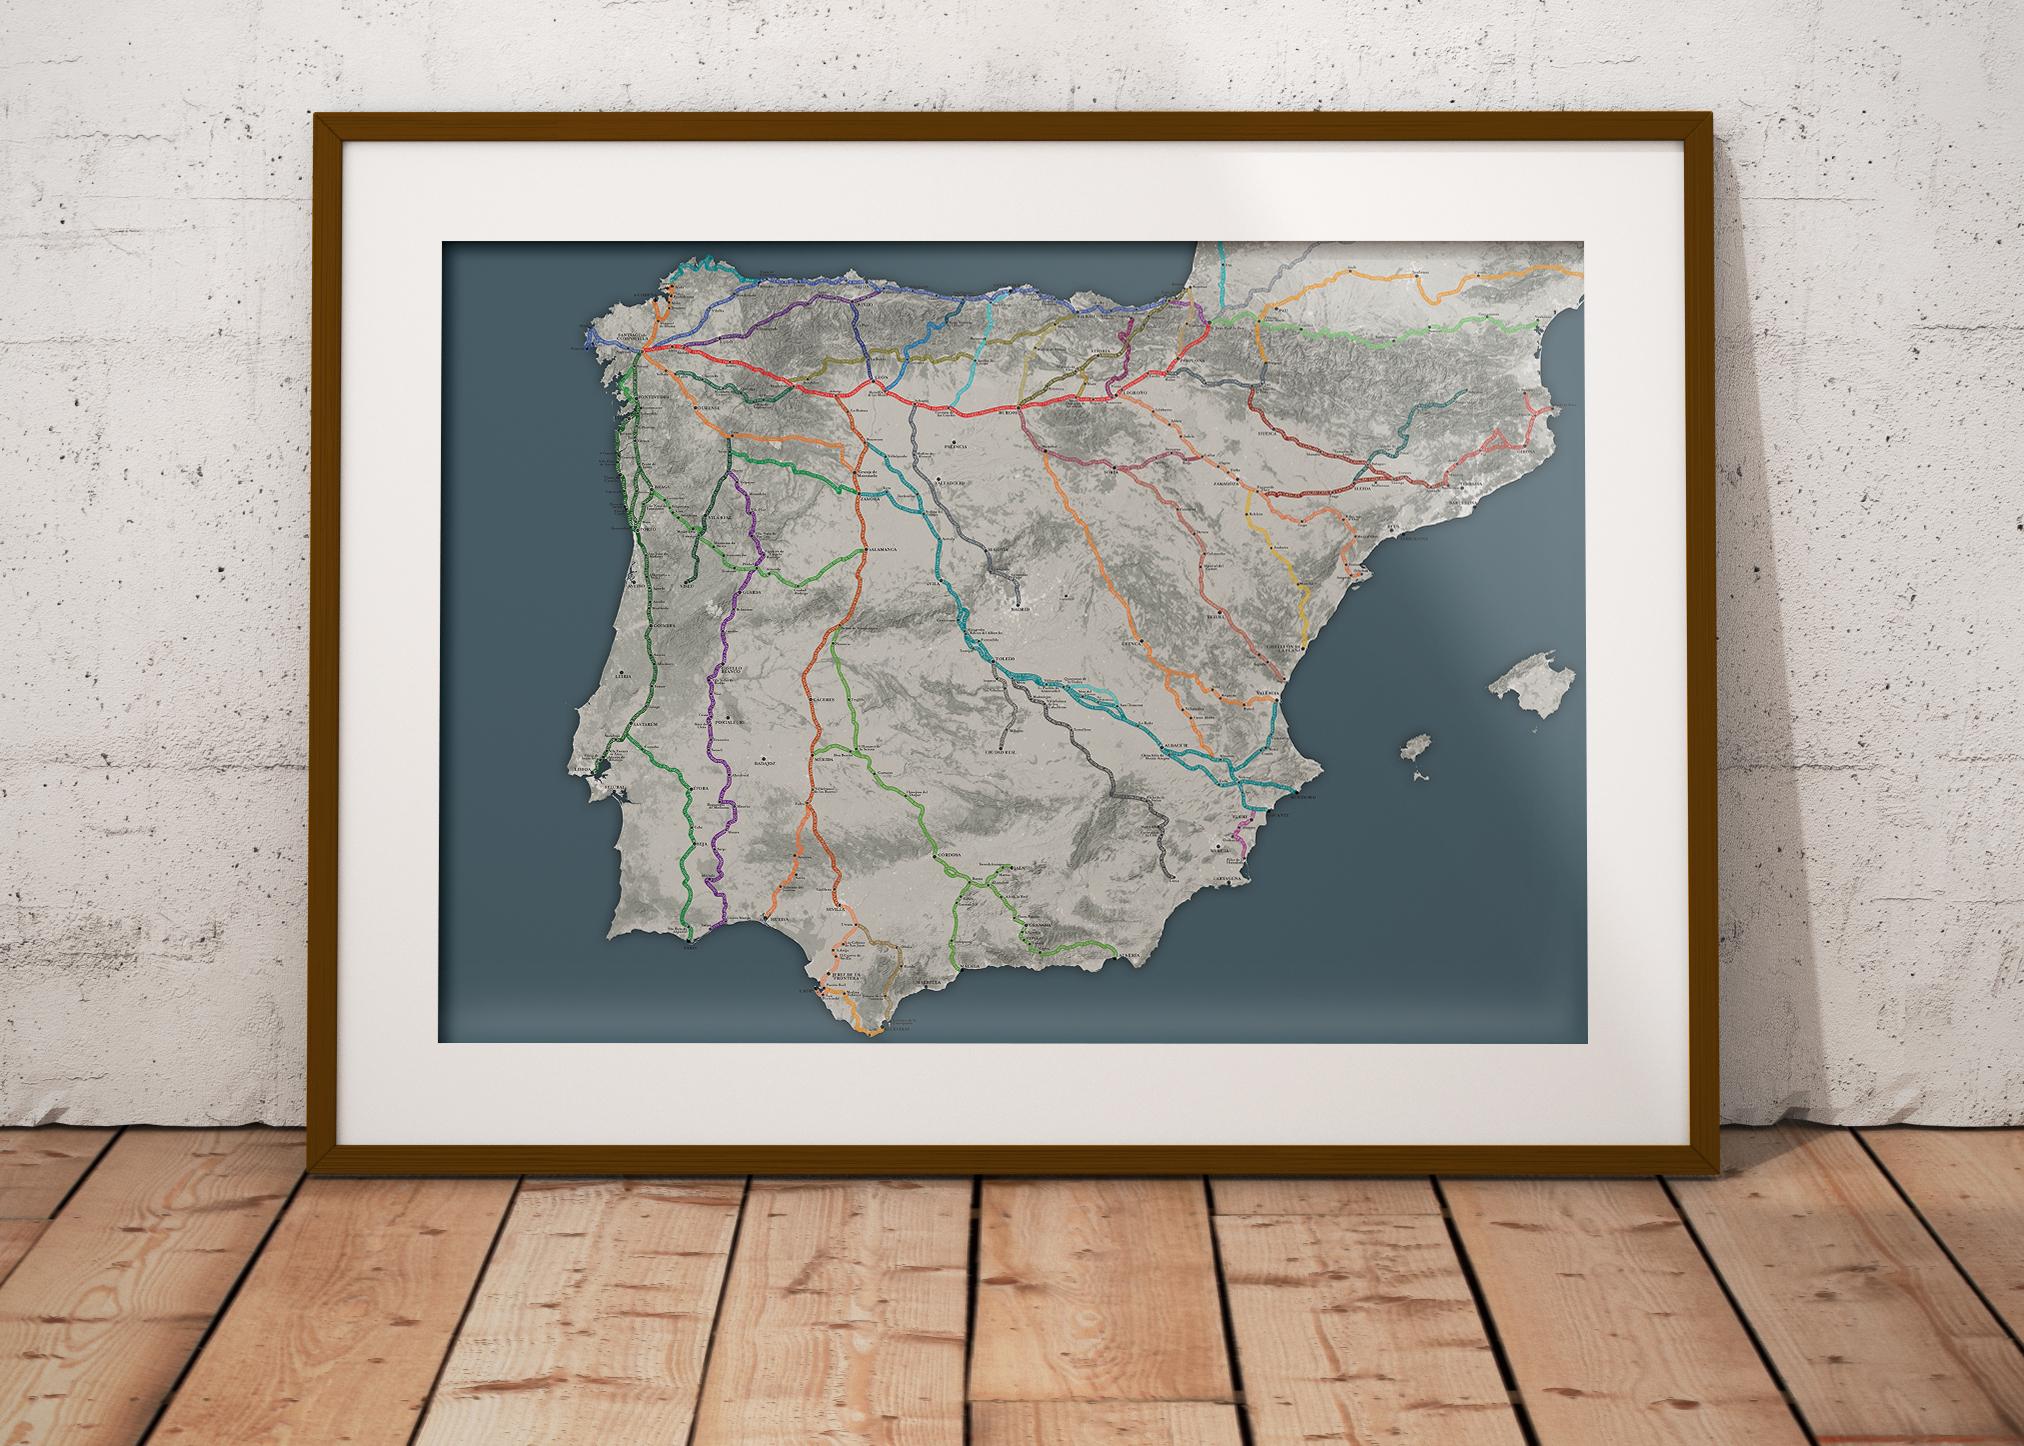 Big Map Of Spain.The Big Map Of The Camino De Santiago Wise Pilgrim Guidebooks For